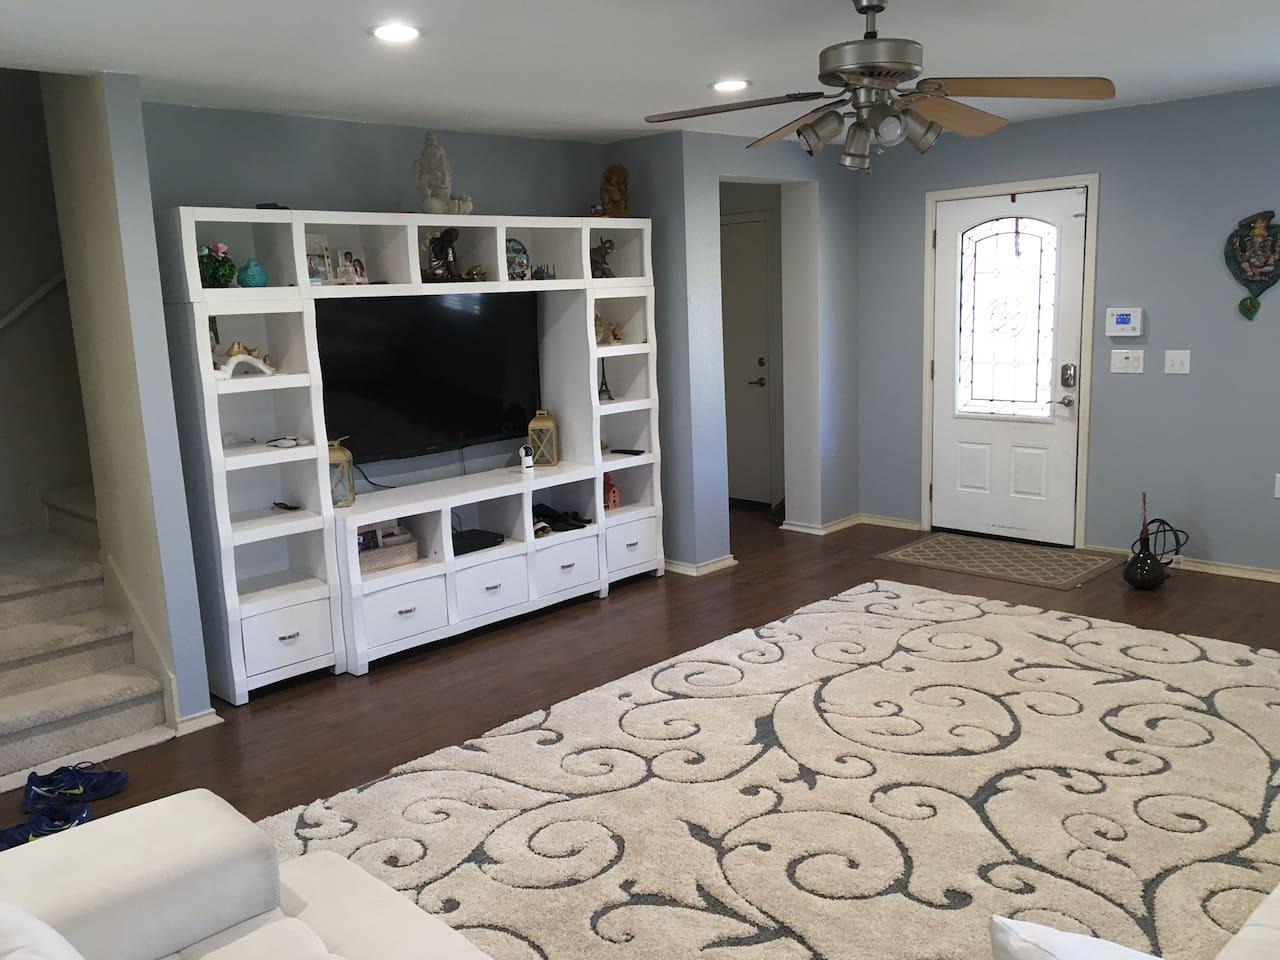 Living Room - 65 inch smart tv